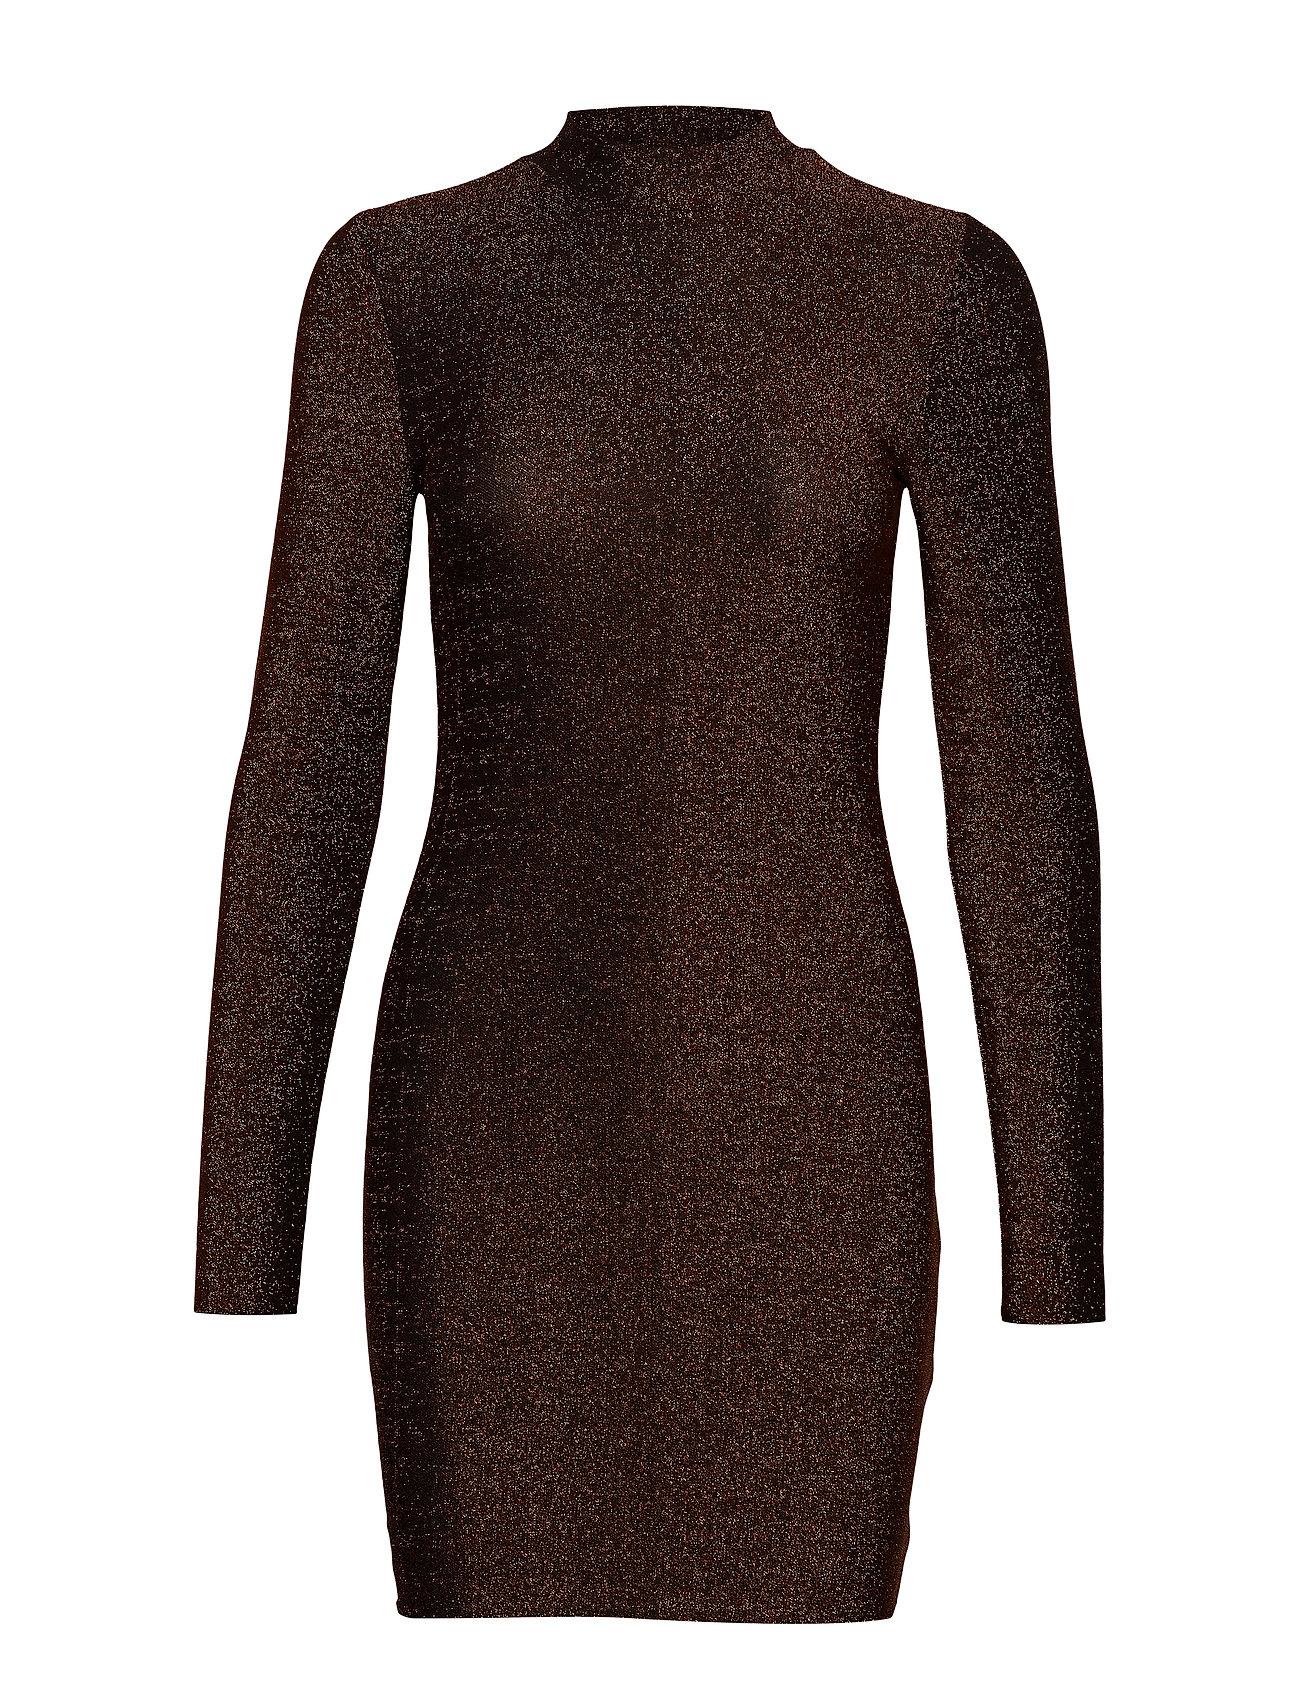 GoldSamsøeamp; n O Dress Jennie 9559inca YE9DH2IW